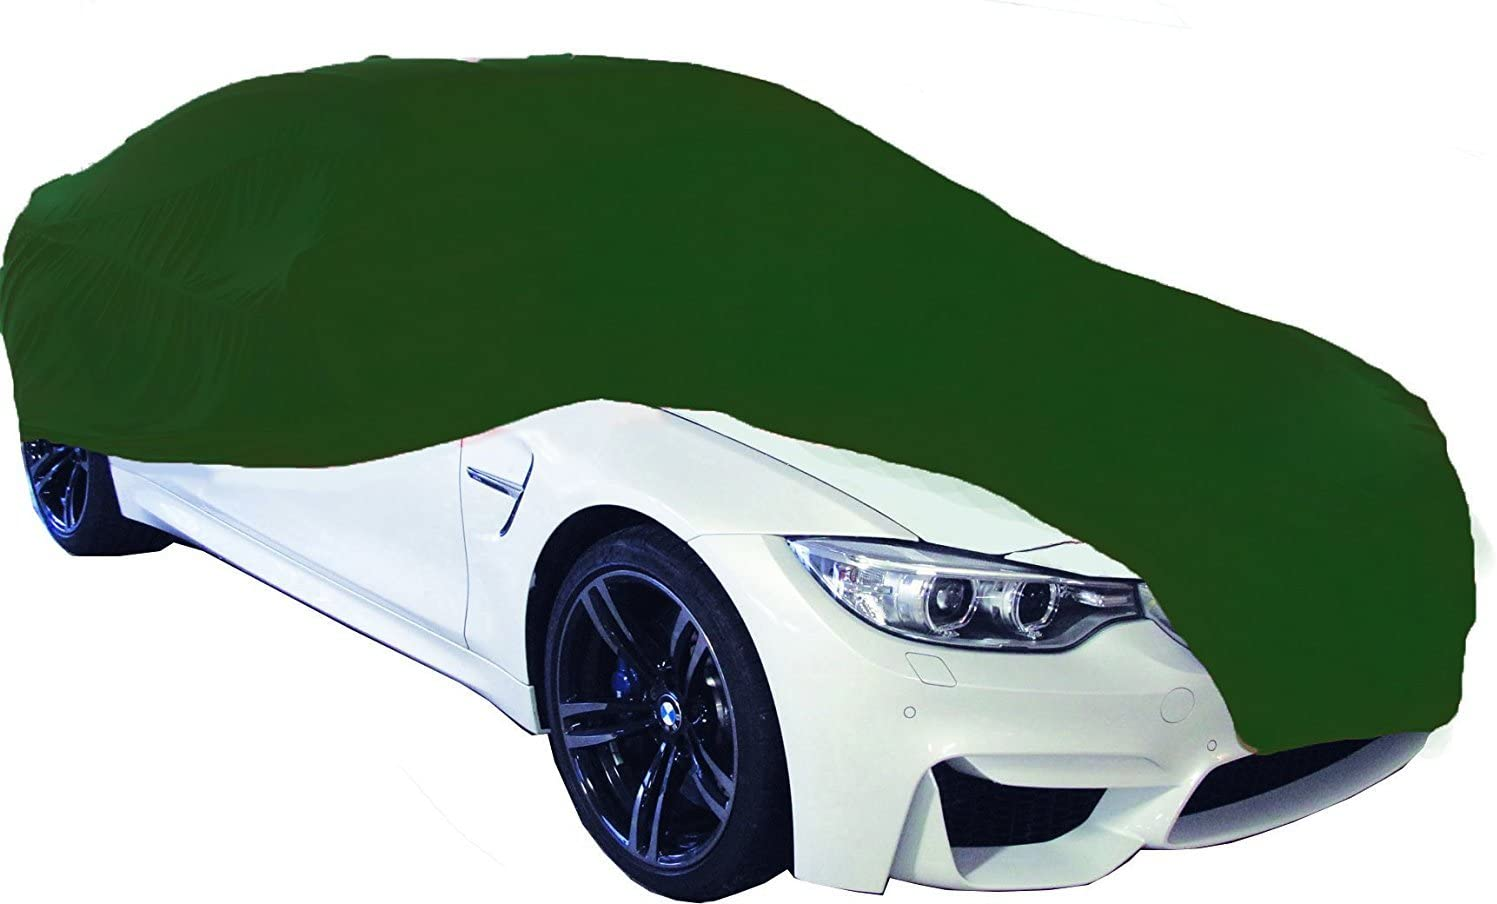 Cosmos Int/érieur Garage Housse de Voiture Medium Green 10324